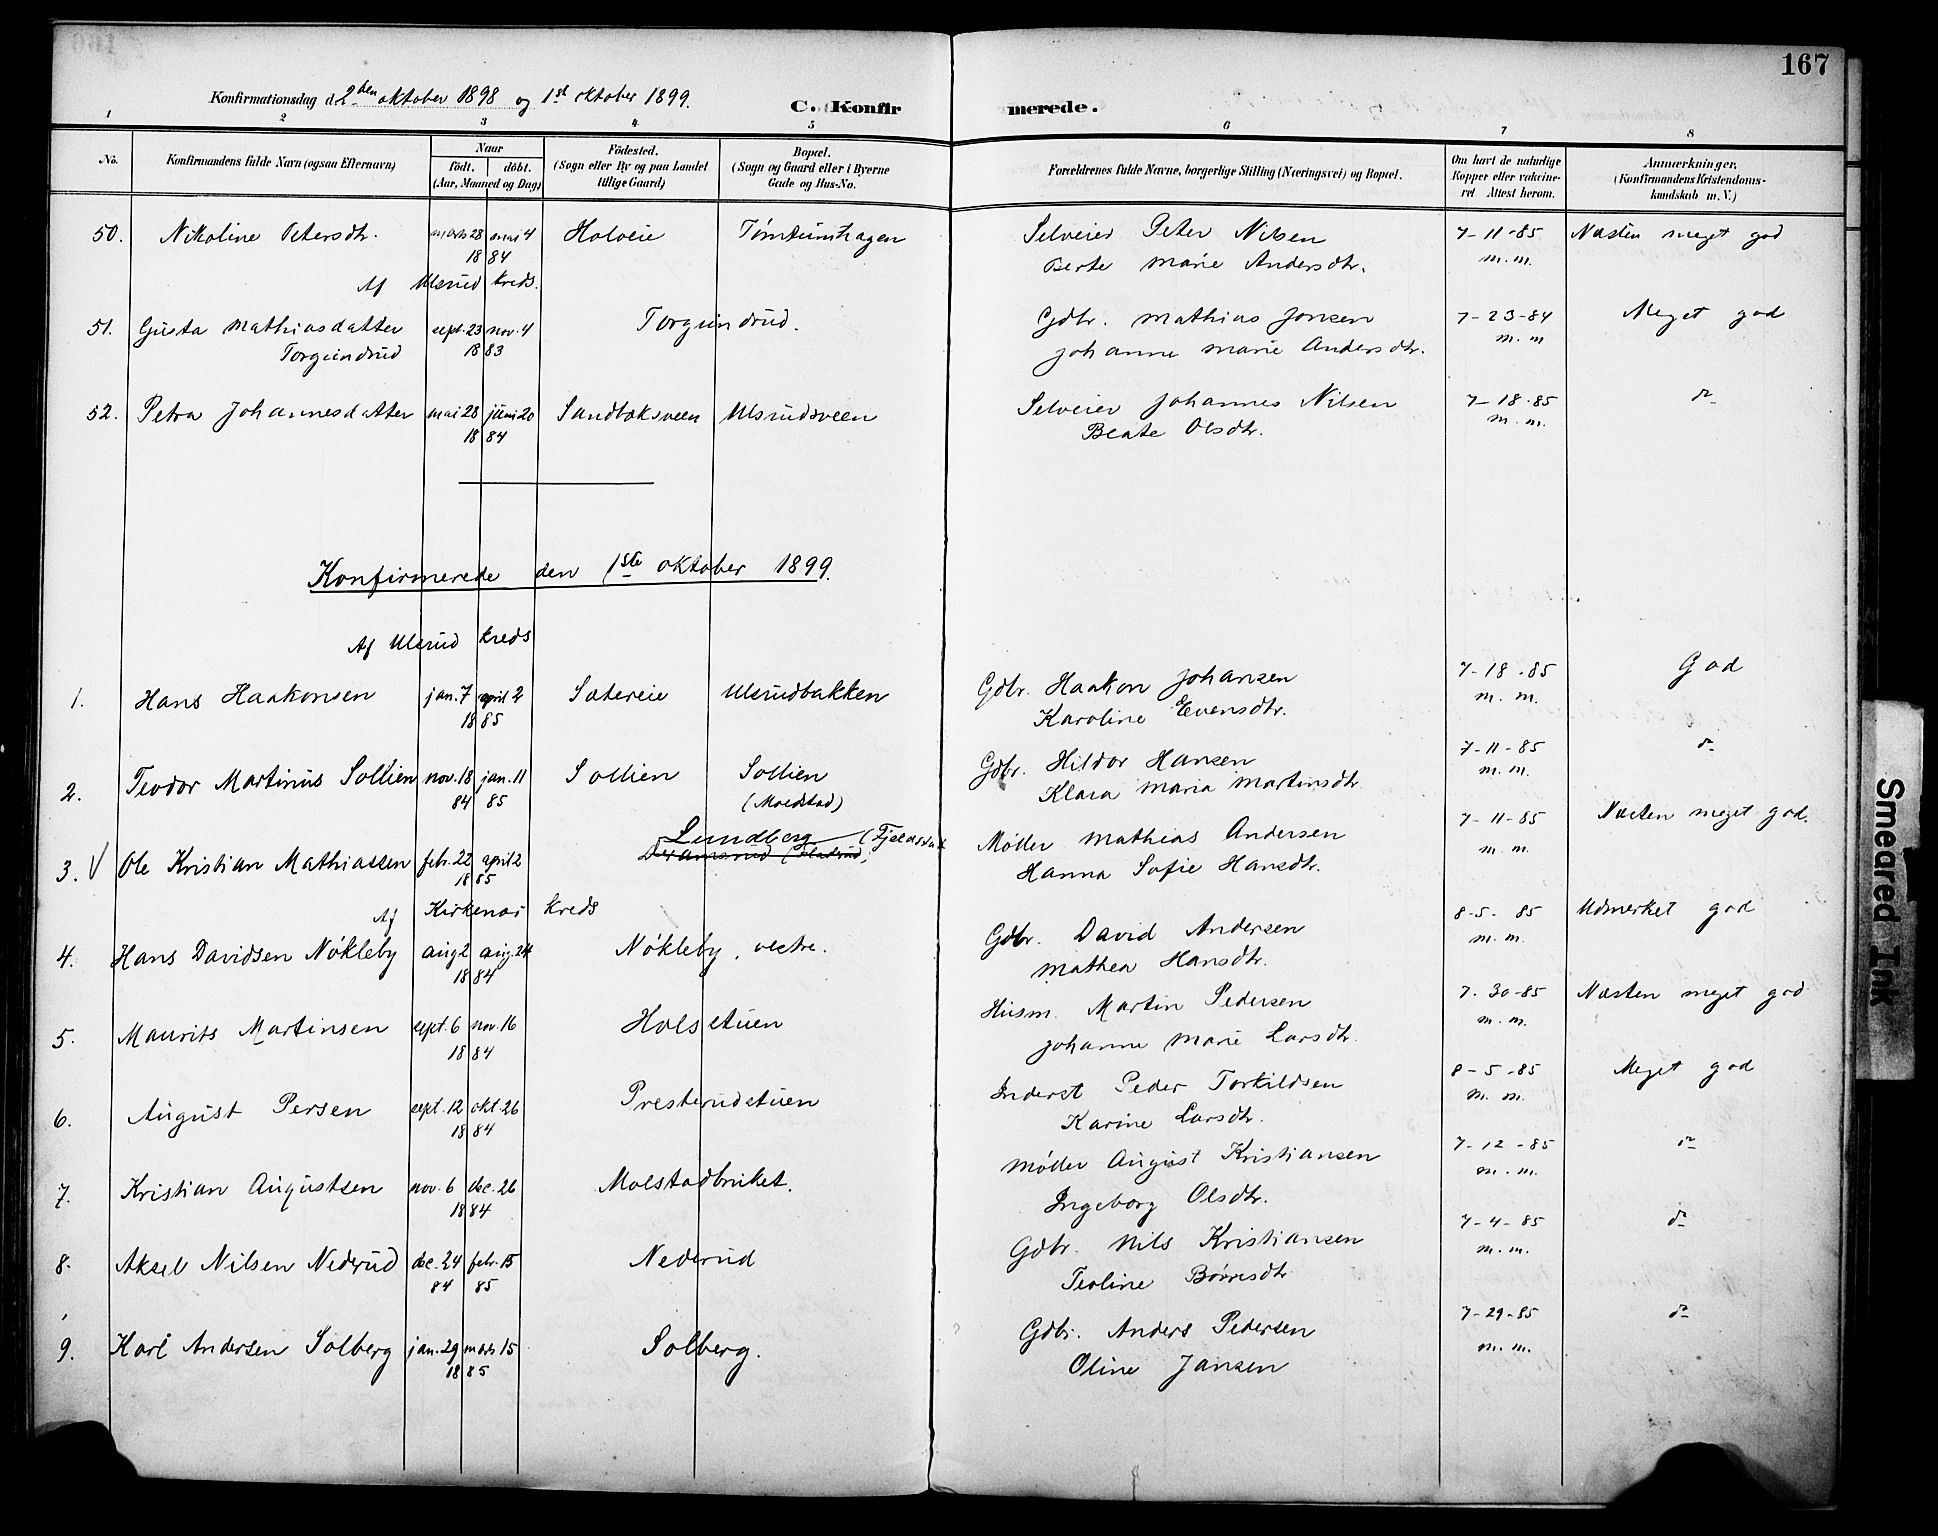 SAH, Vestre Toten prestekontor, H/Ha/Haa/L0013: Ministerialbok nr. 13, 1895-1911, s. 167